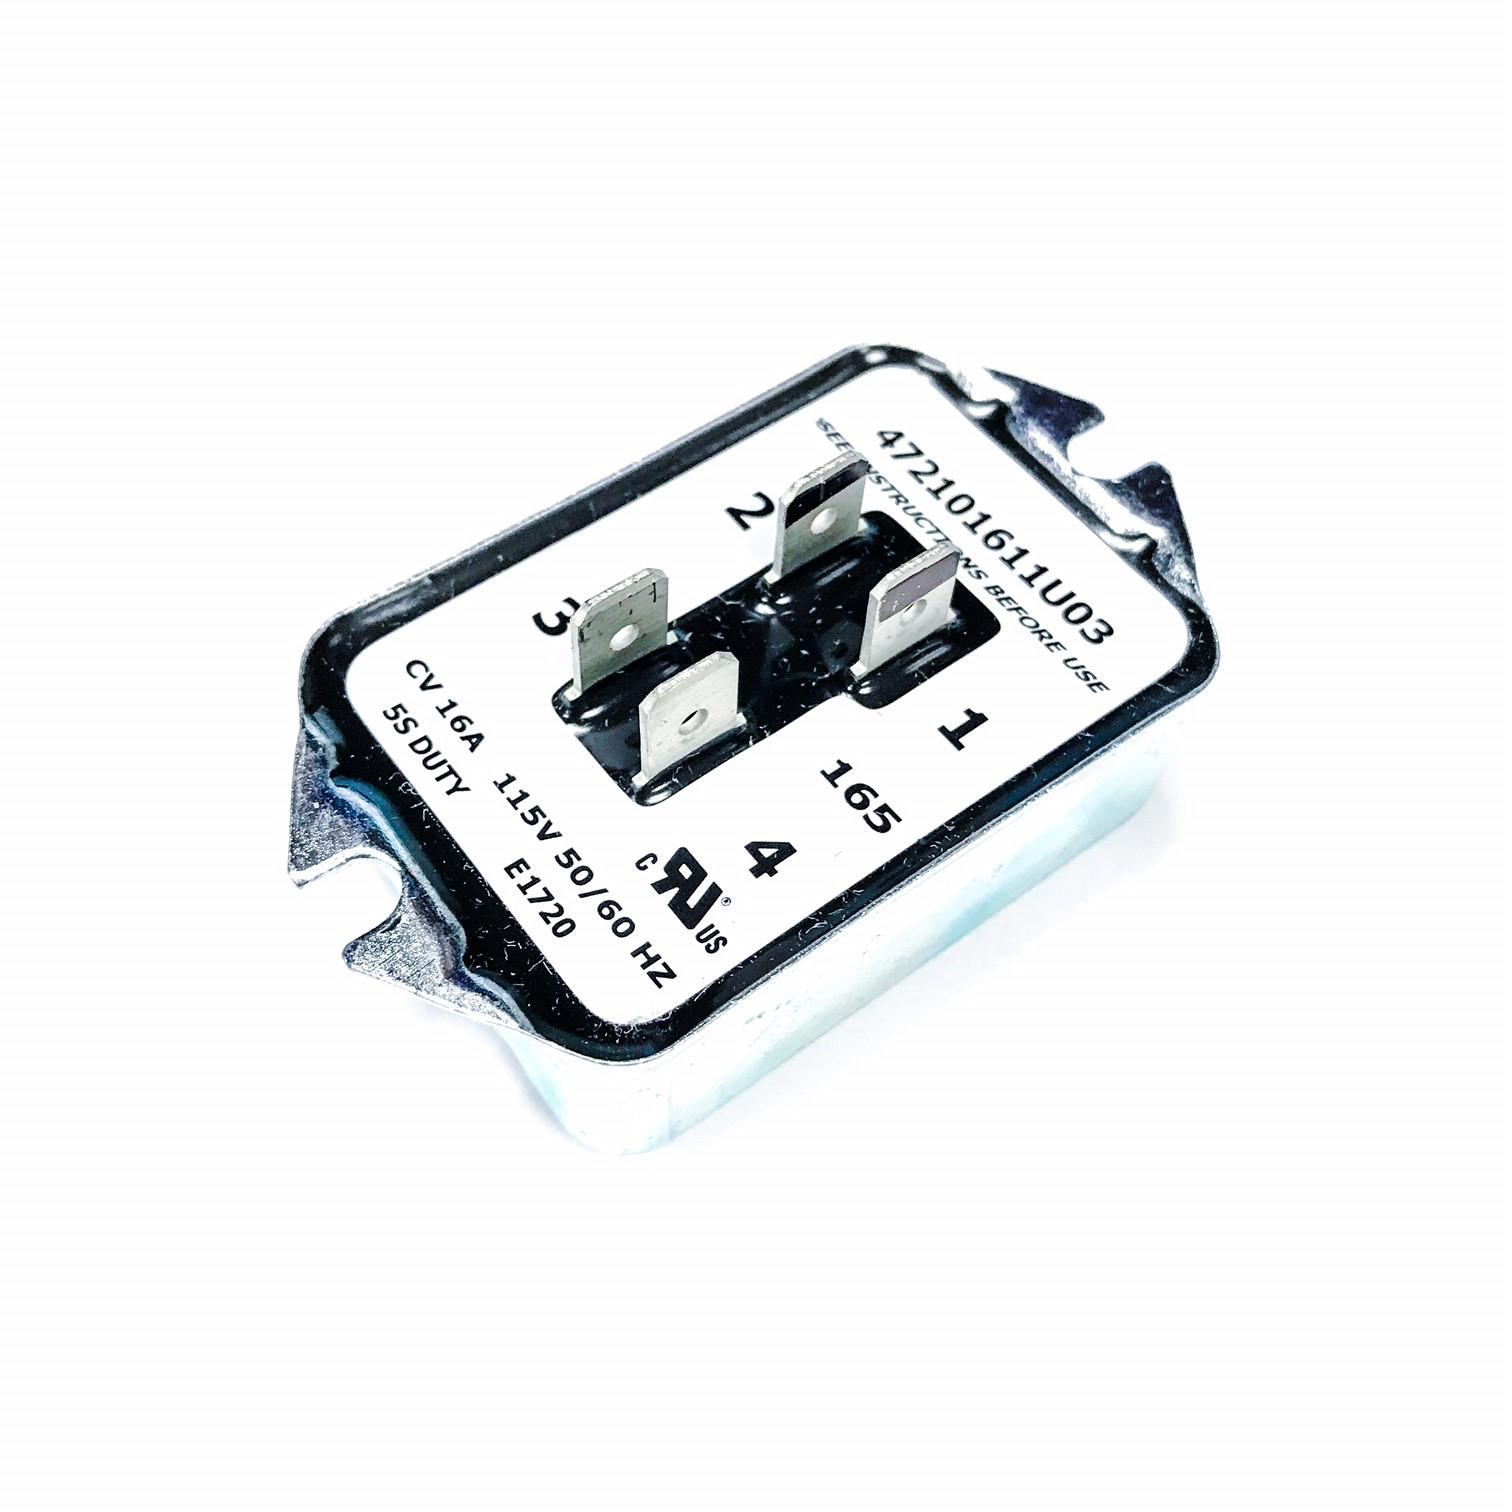 doc diagram salzer drum switch switches wiring reversing [ 1512 x 1512 Pixel ]